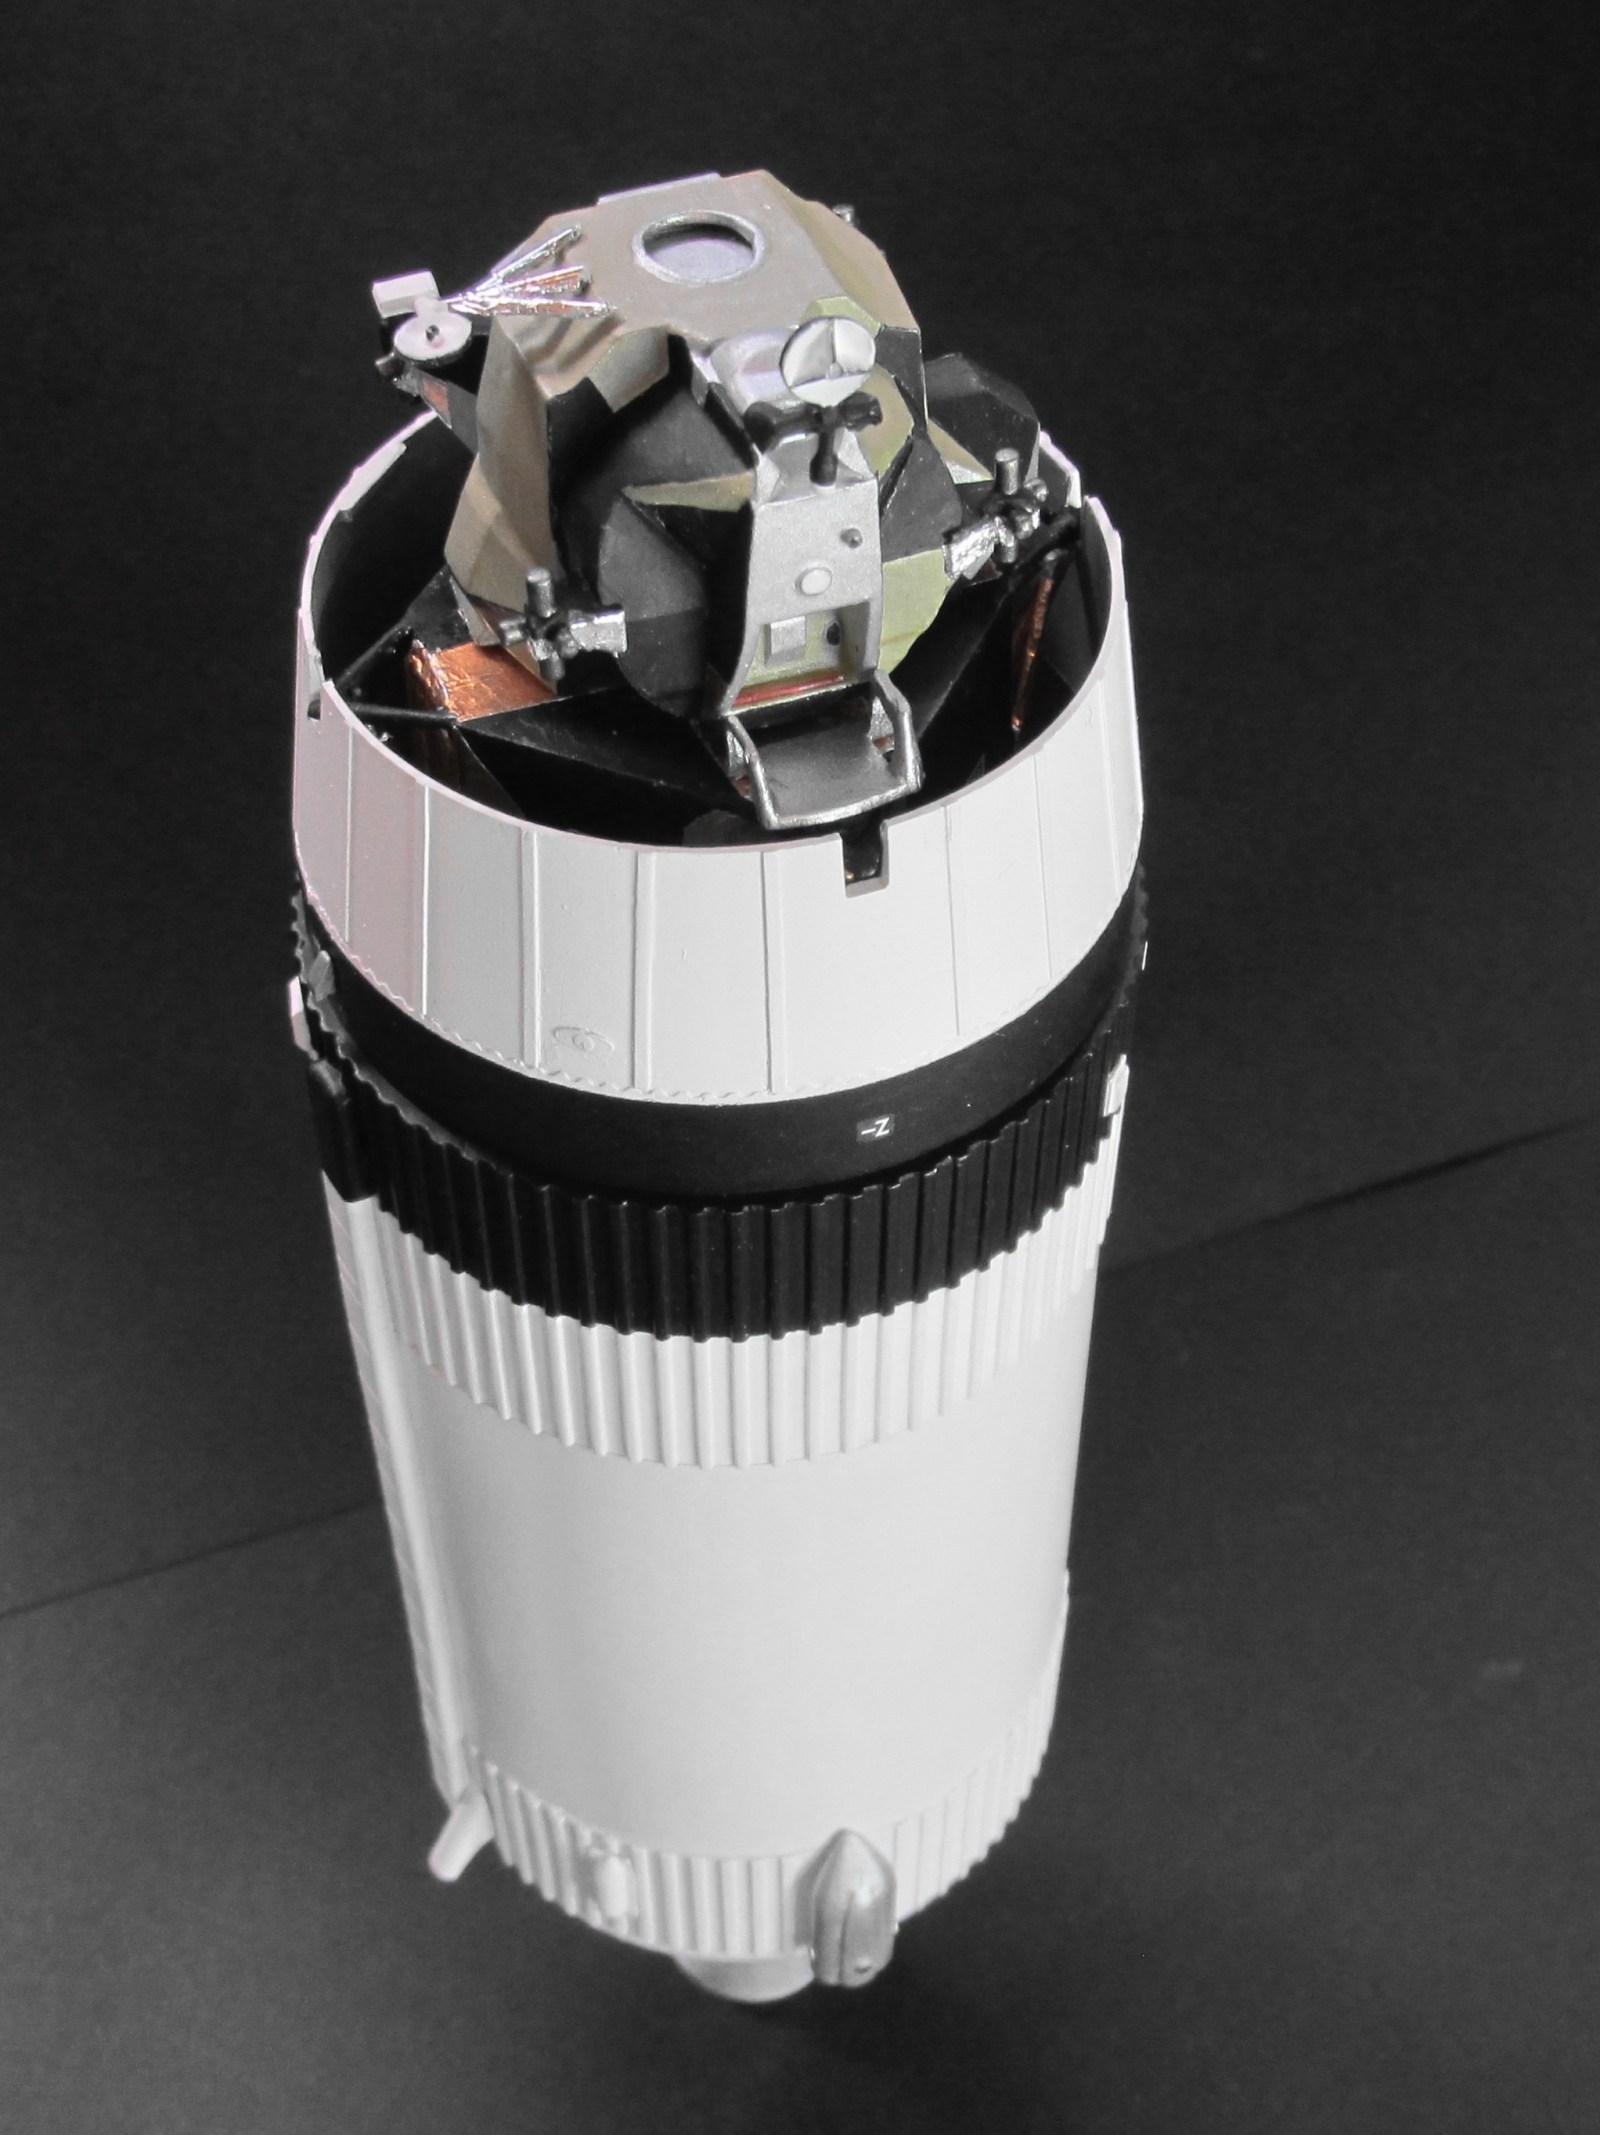 Click image for larger version.  Name:lunar module 4.jpg Views:13 Size:354.4 KB ID:24368